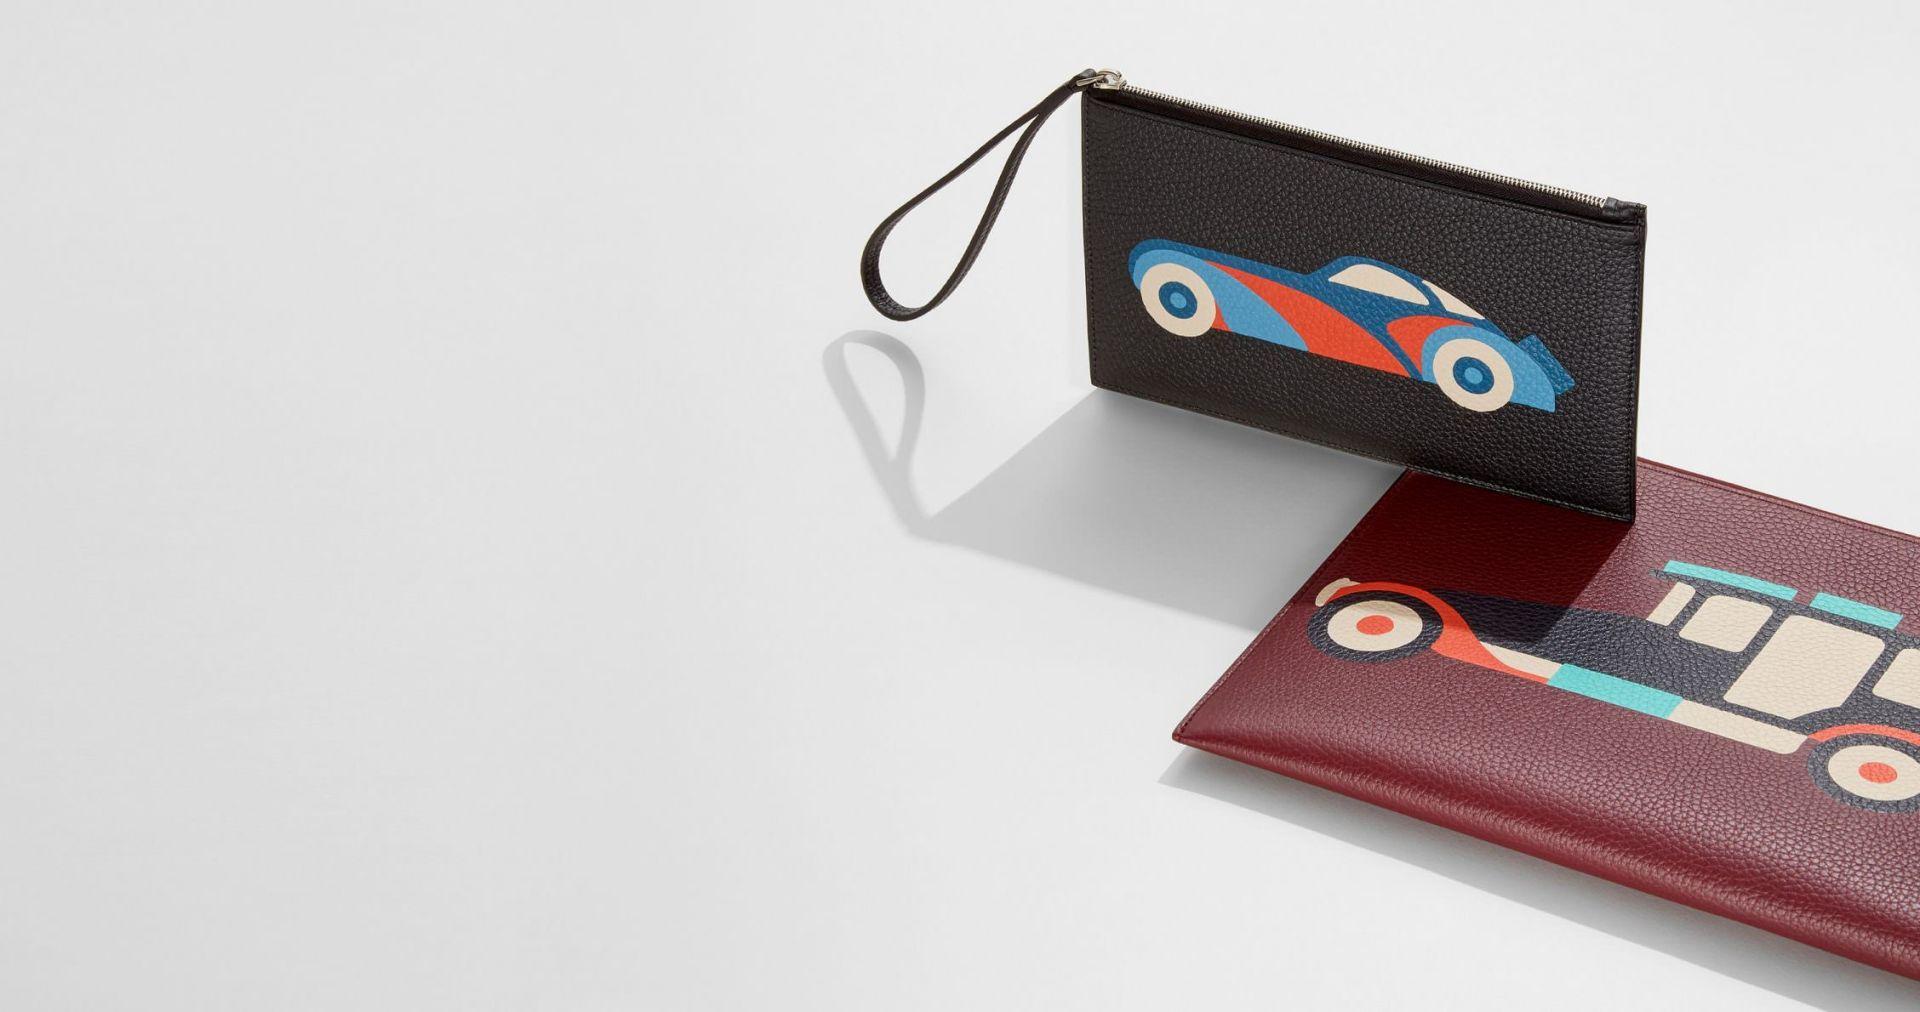 Moynat Marquetry Mosaique | CoffeeAndHandbags.com #Moynat #DesignerHandbags #LeatherGoods